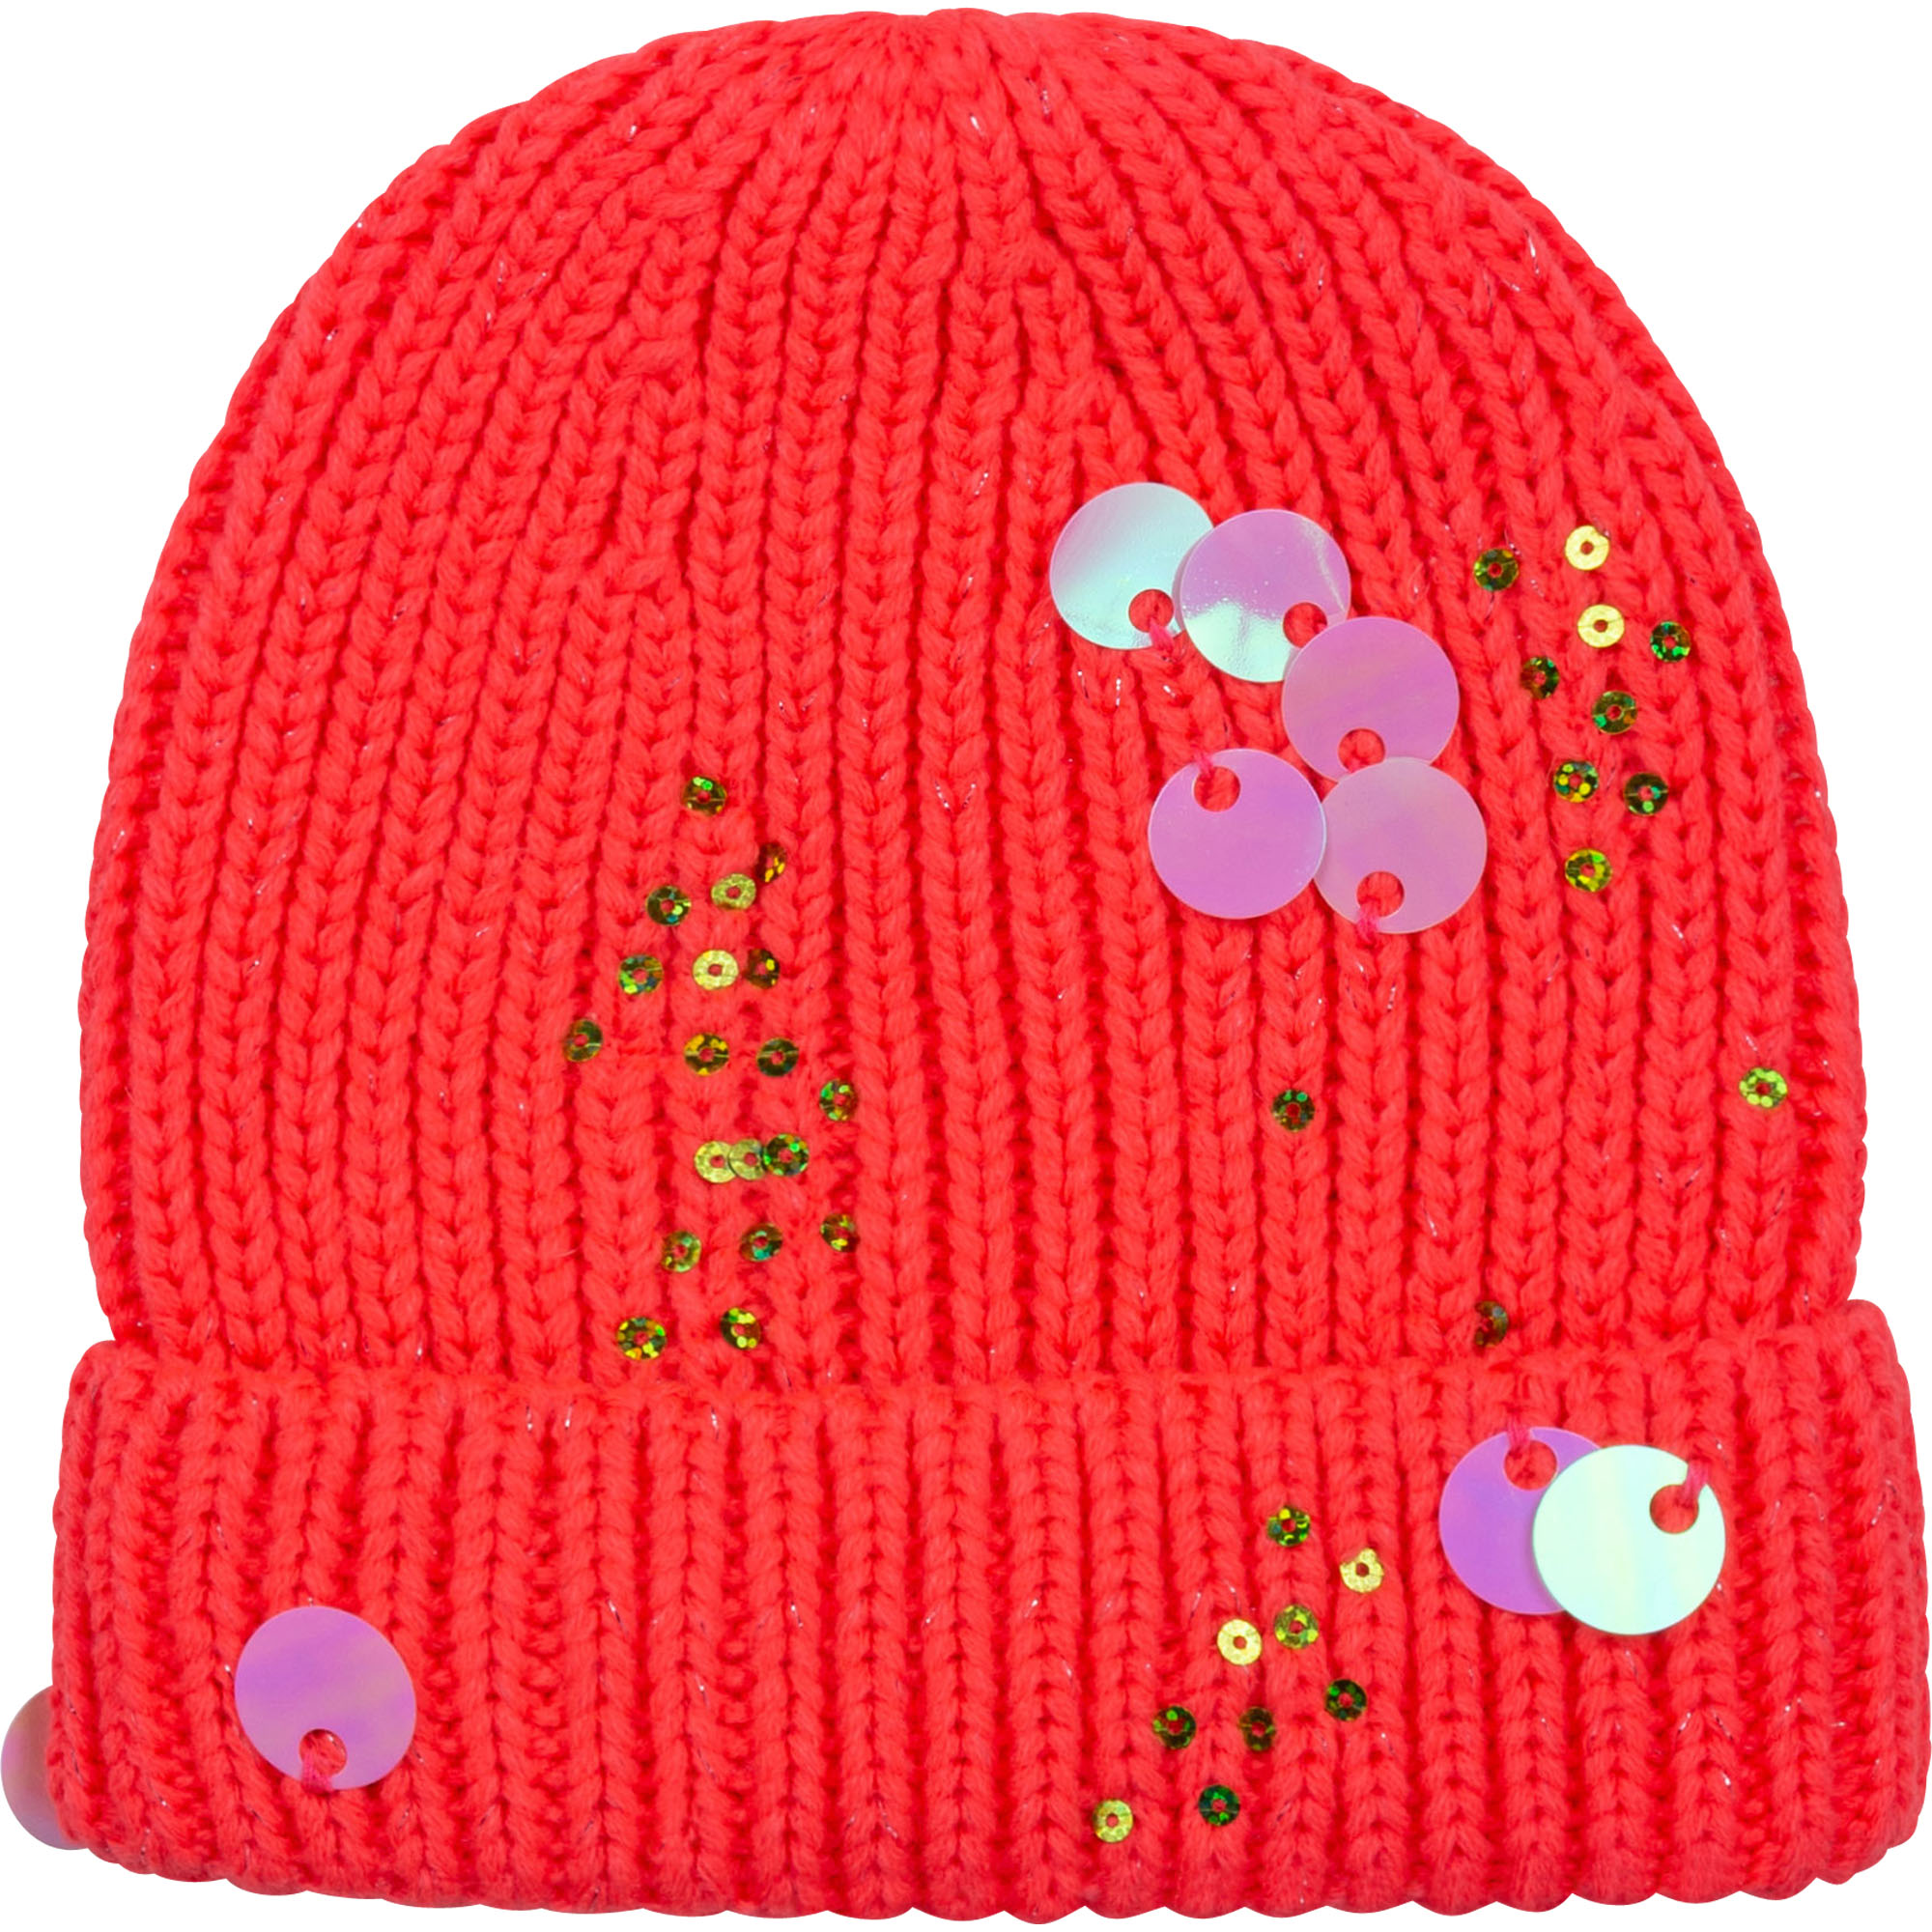 Iridescent knit hat BILLIEBLUSH for GIRL